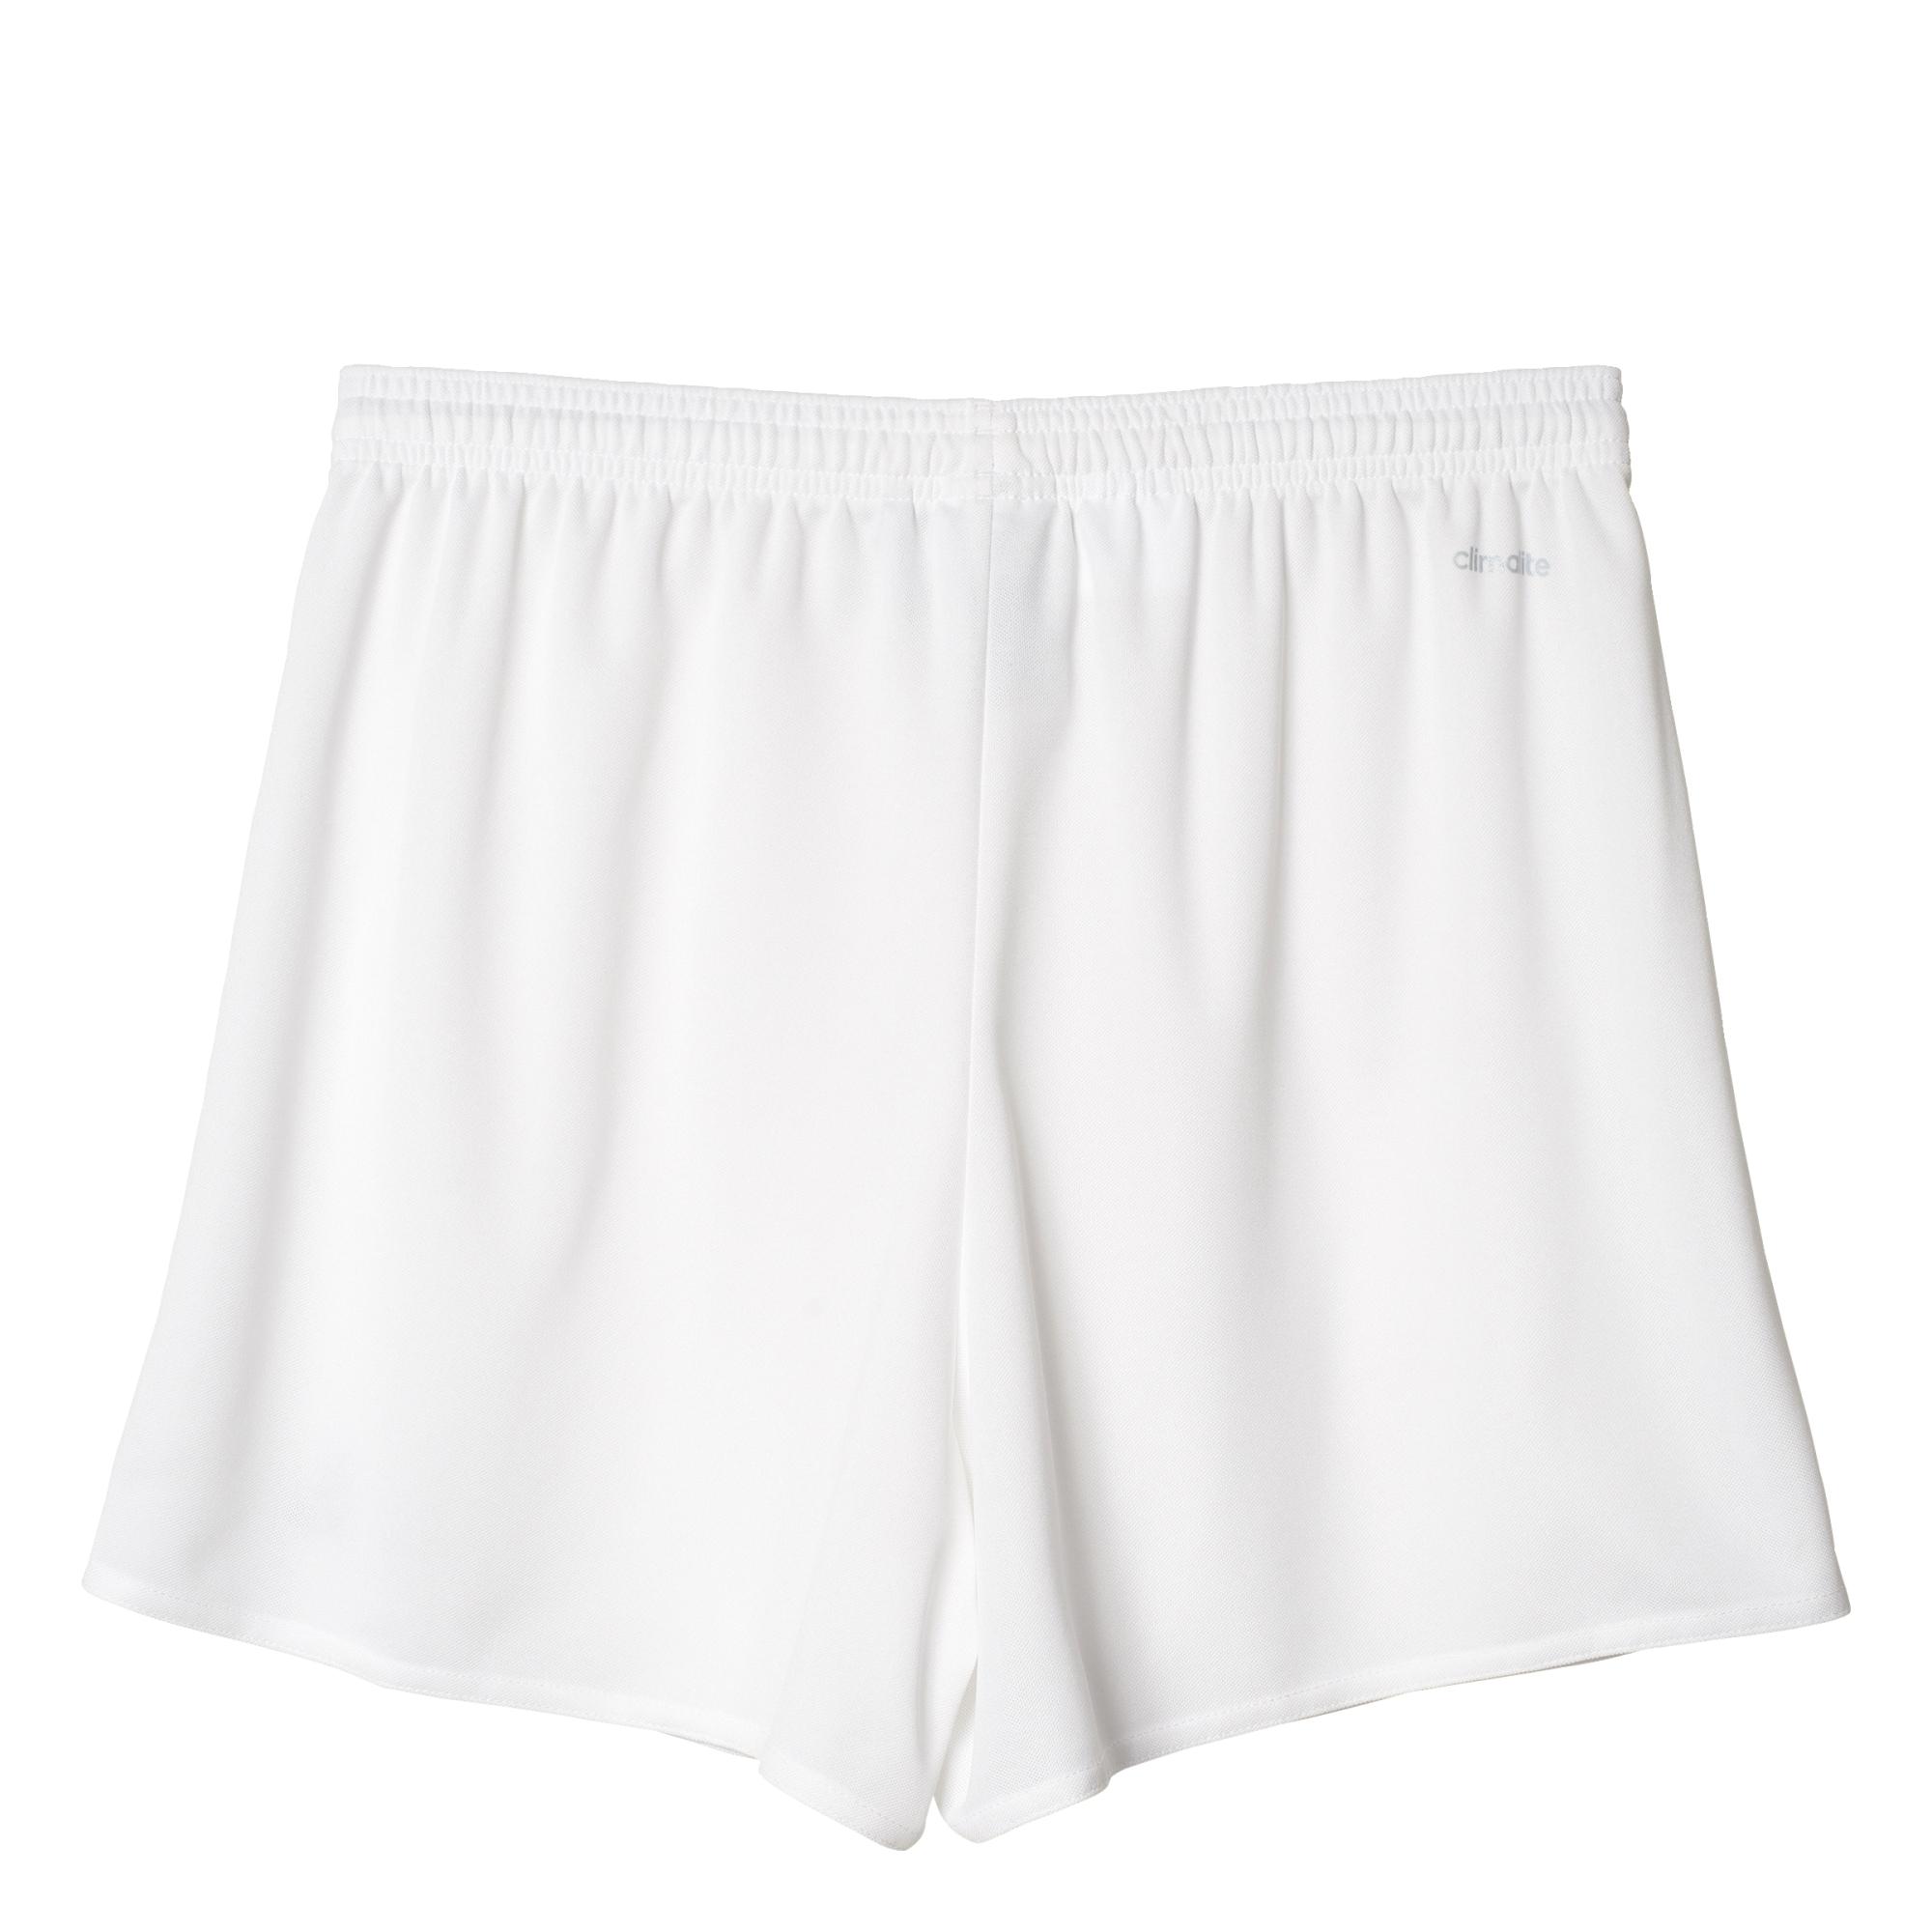 Women's Parma 16 Short, White/Black, swatch